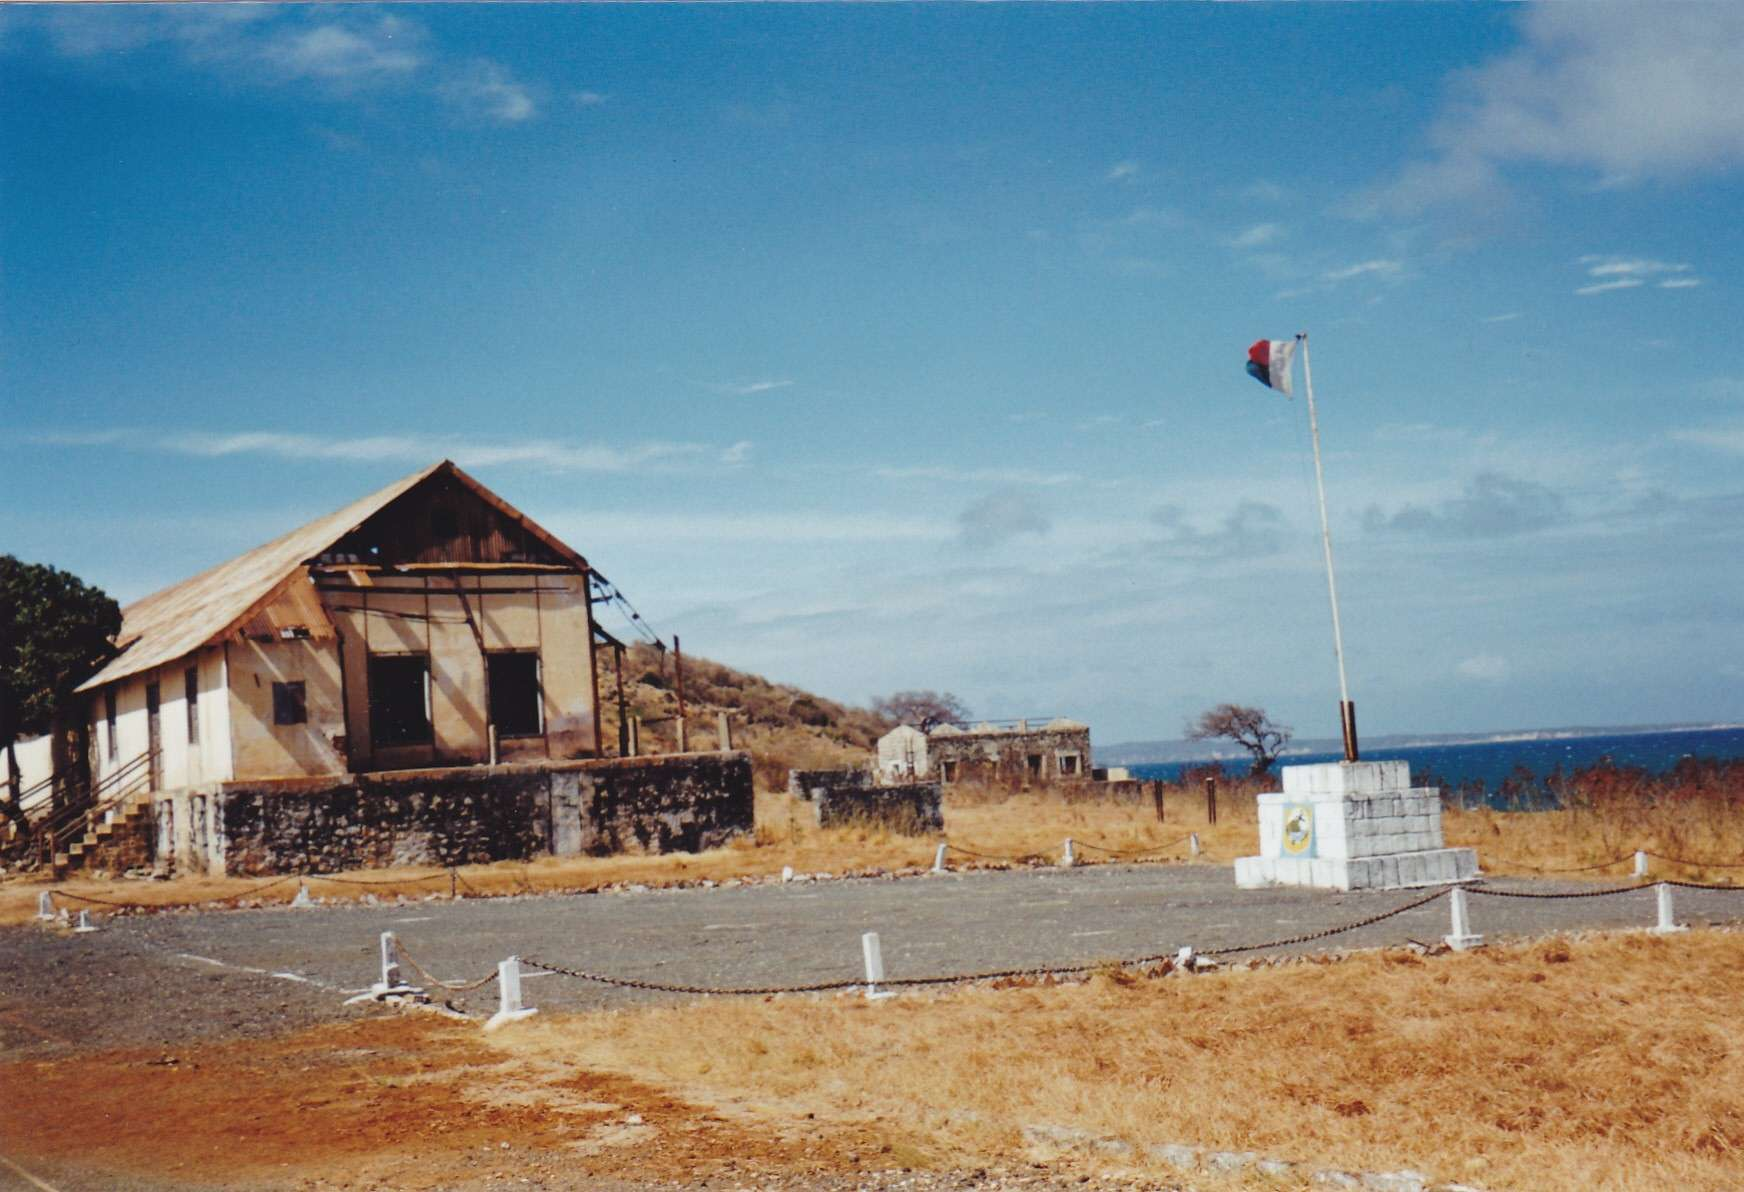 [Divers campagne Madagascar] CAP DIEGO AU CID 1972 - Page 2 Img_0019